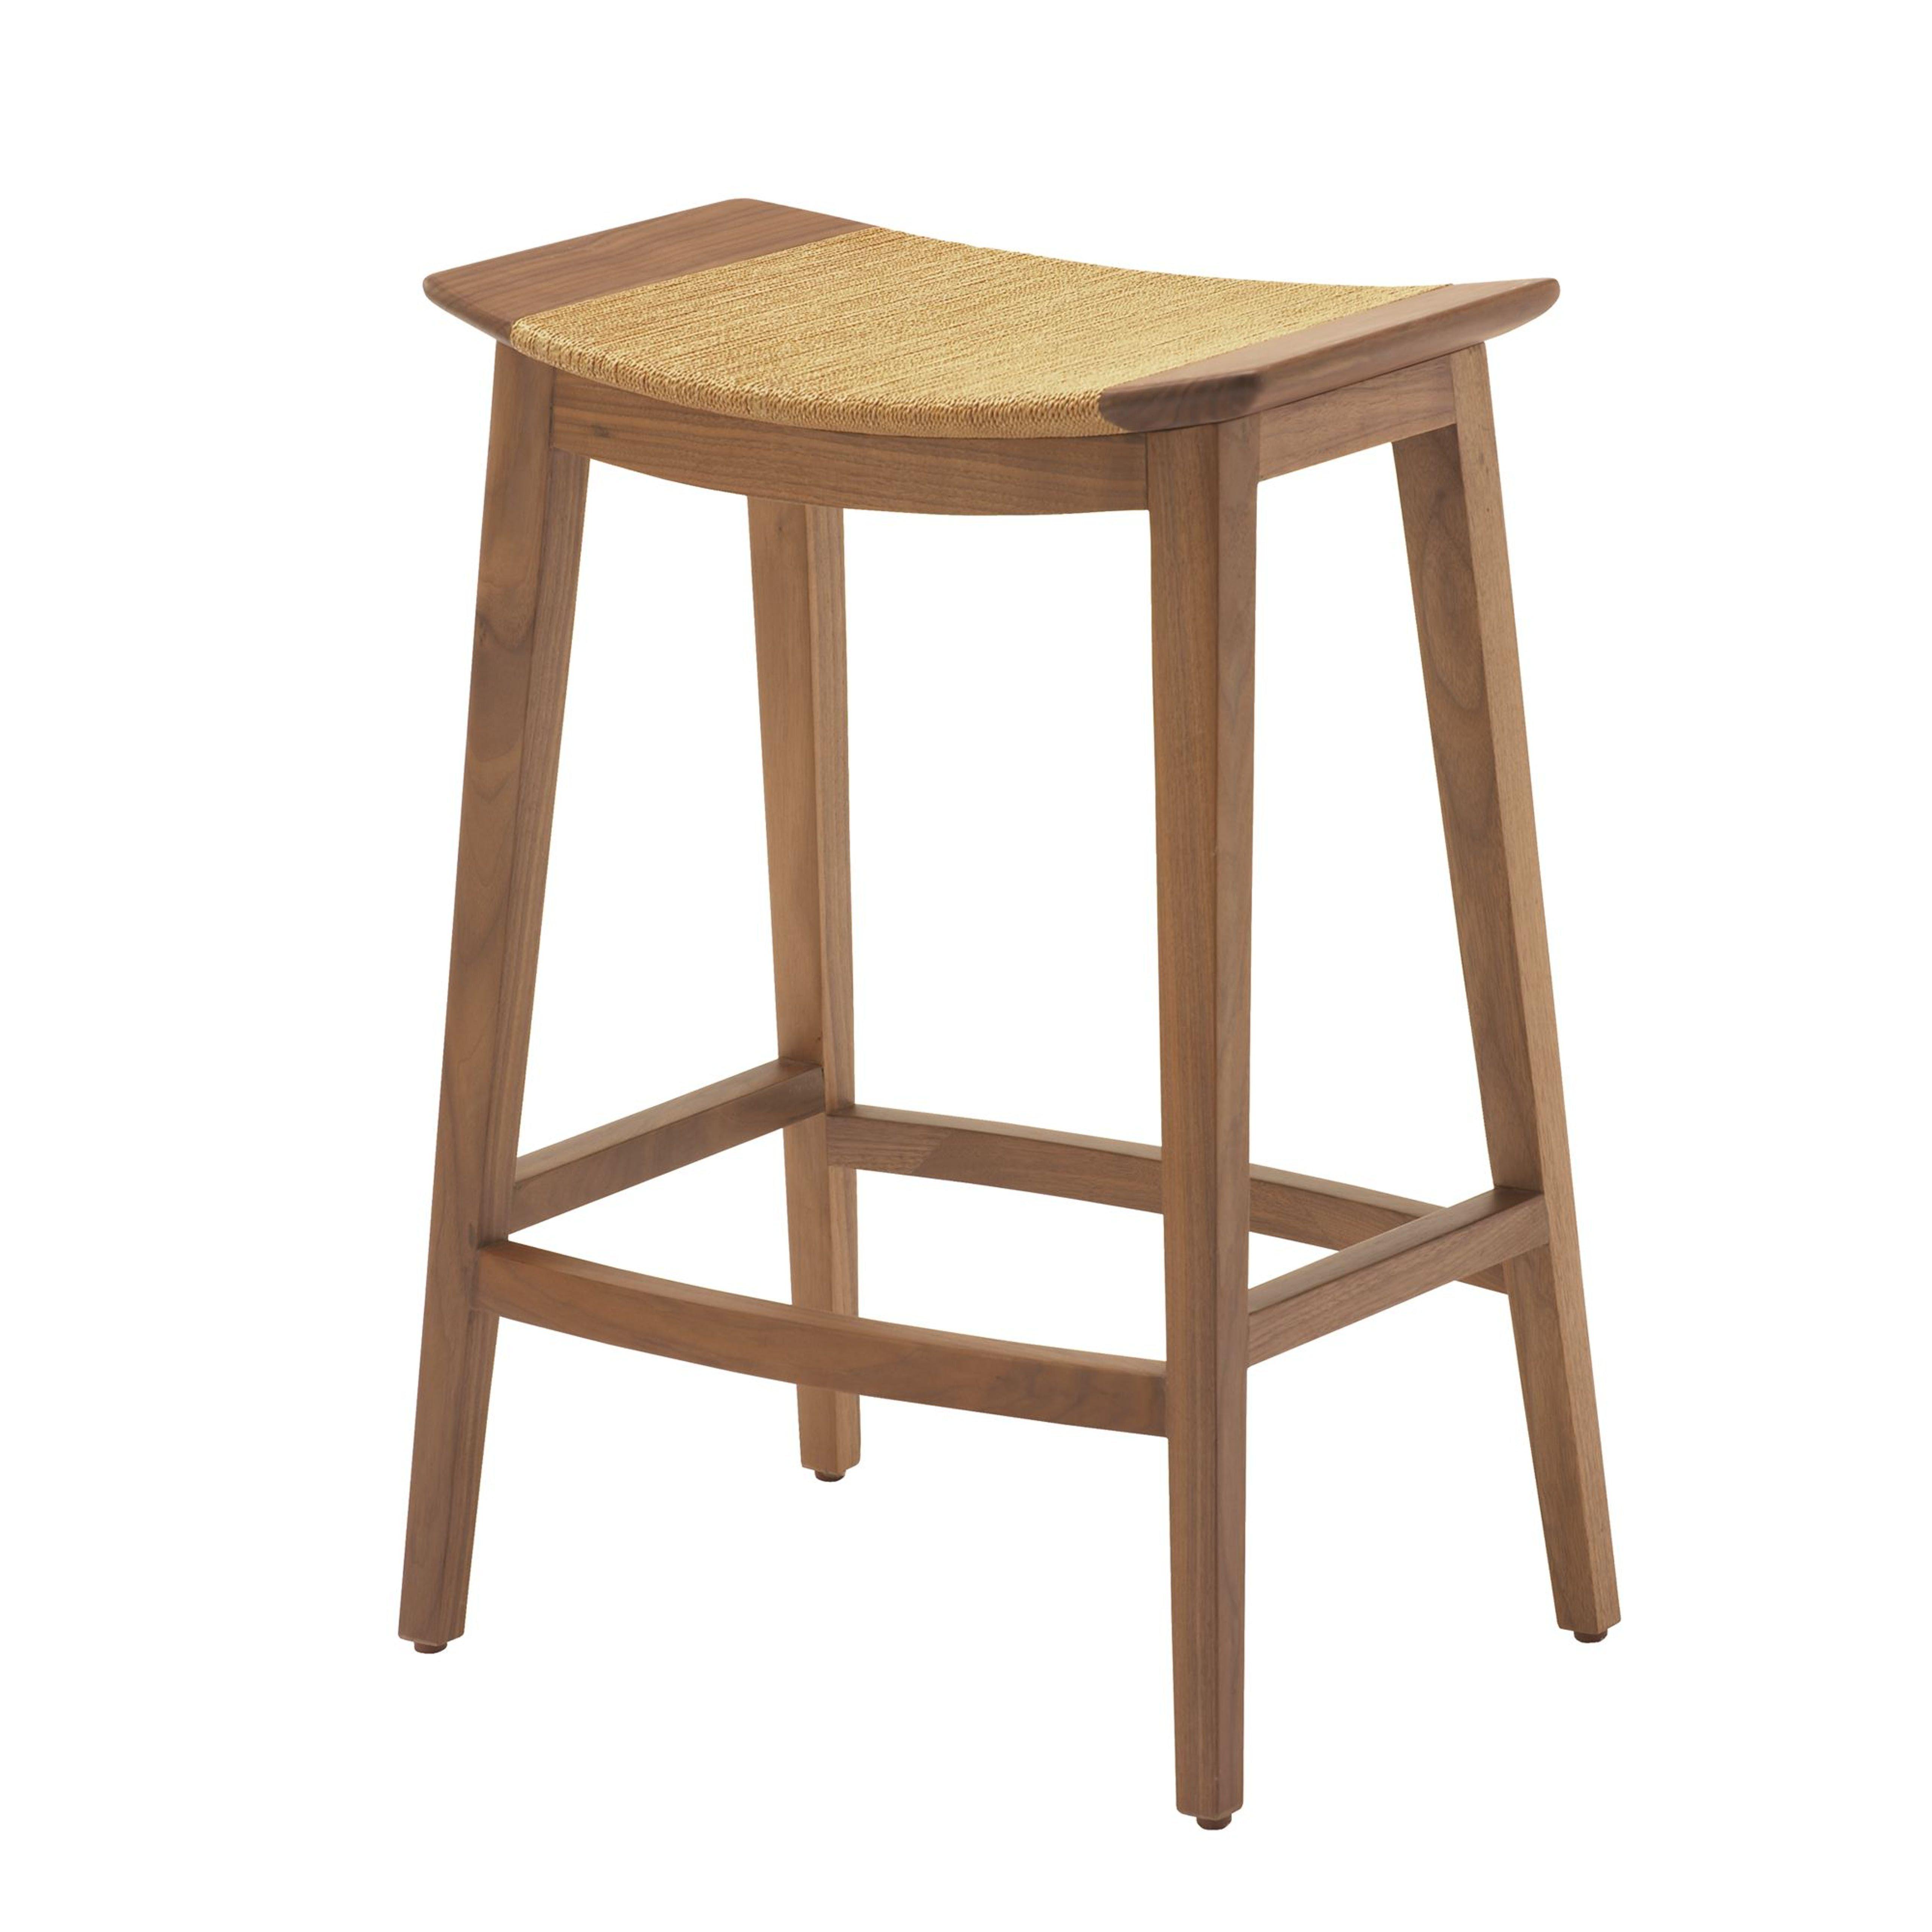 Mcguire Furniture 51551 Furniture Furniture Seating Stools 1476927665 Counter Stools Mcguire Furniture Furniture